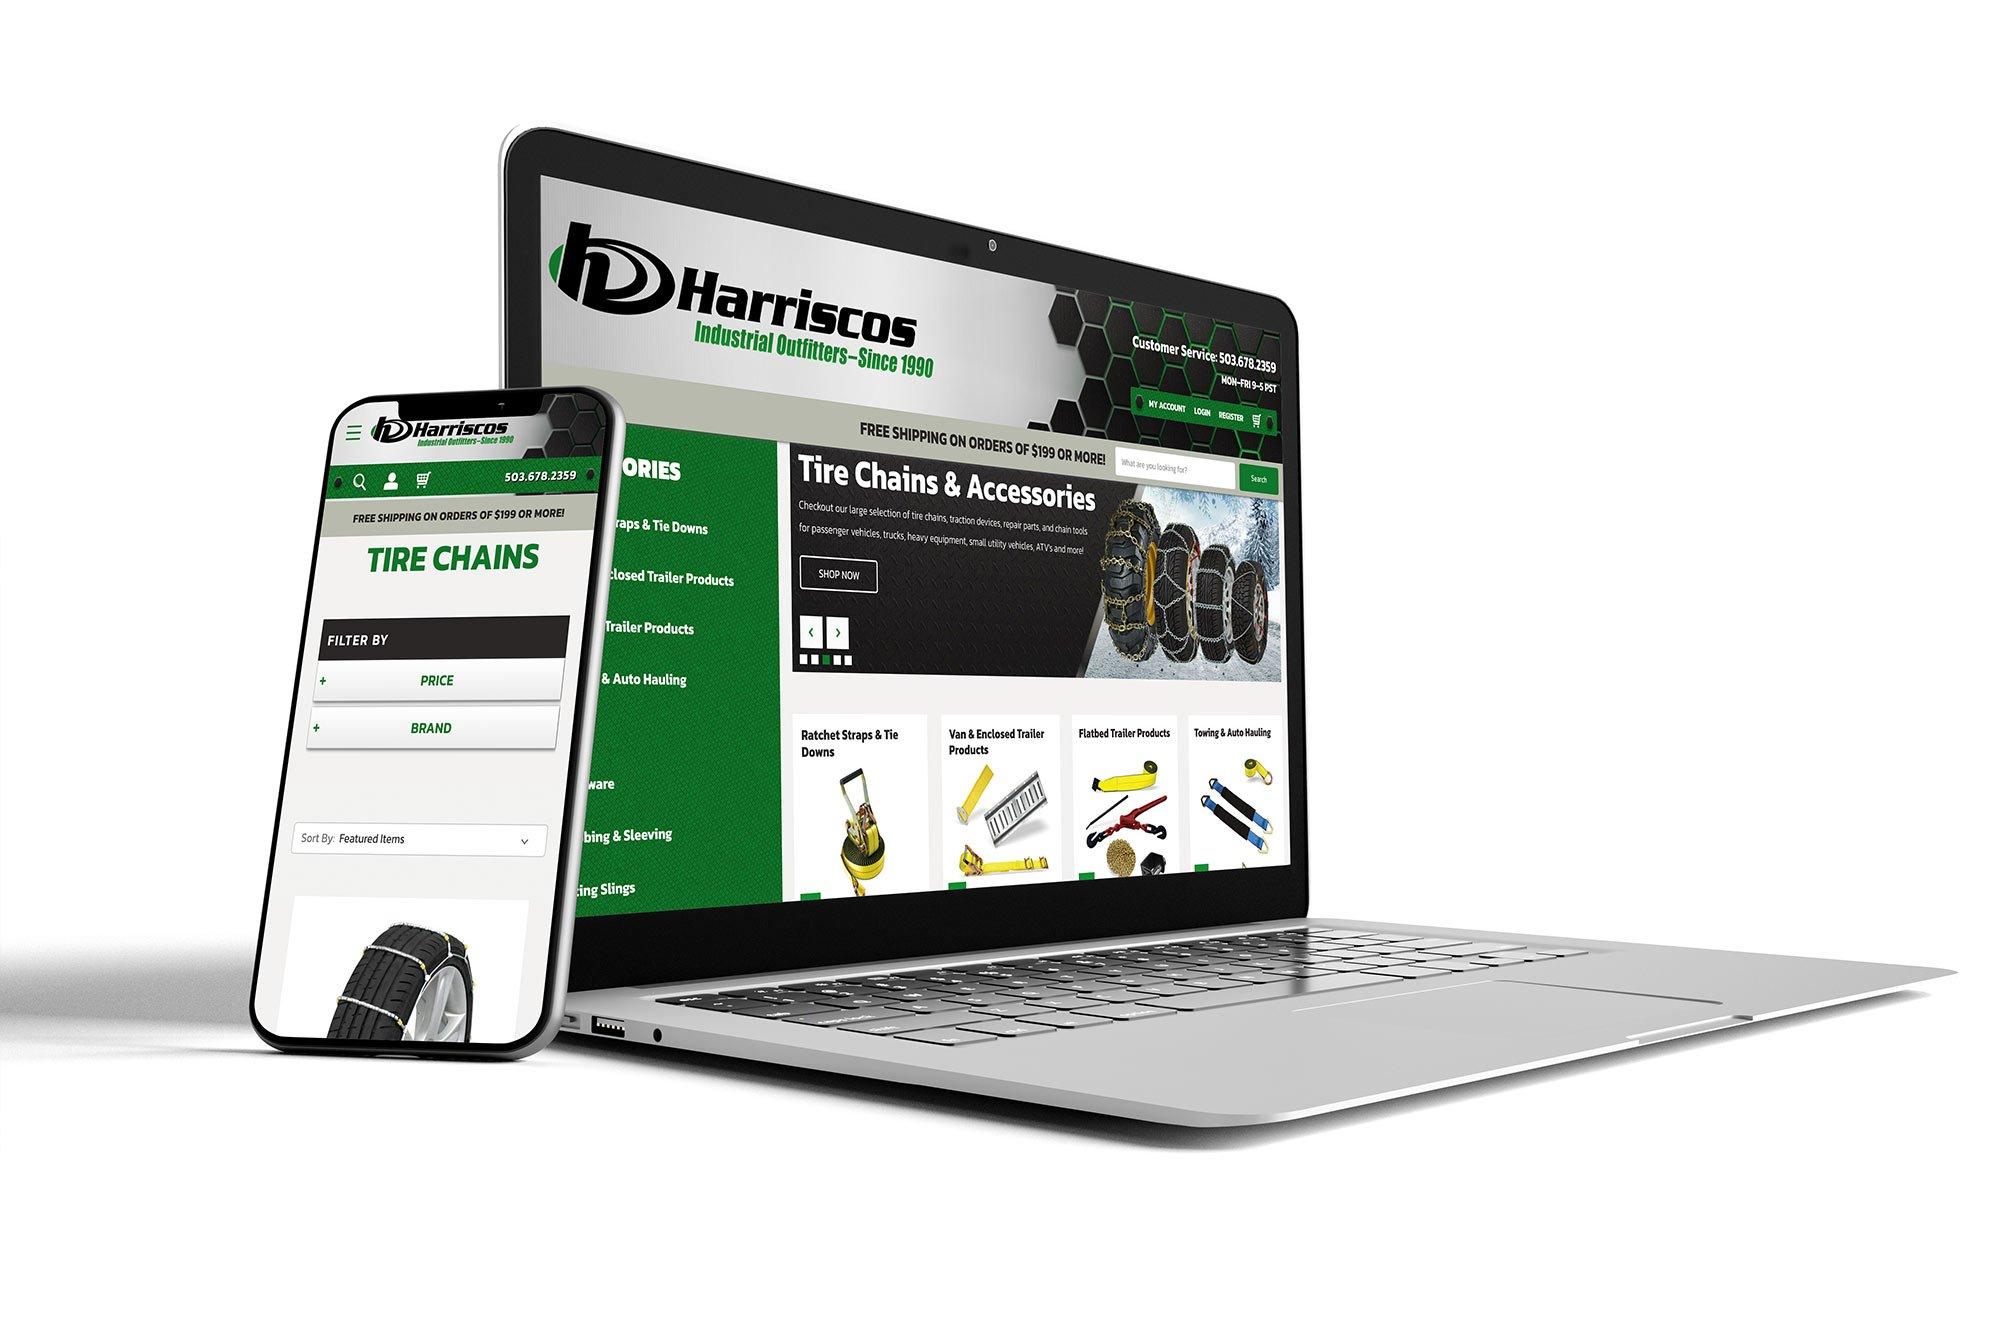 Harriscos responsive web design